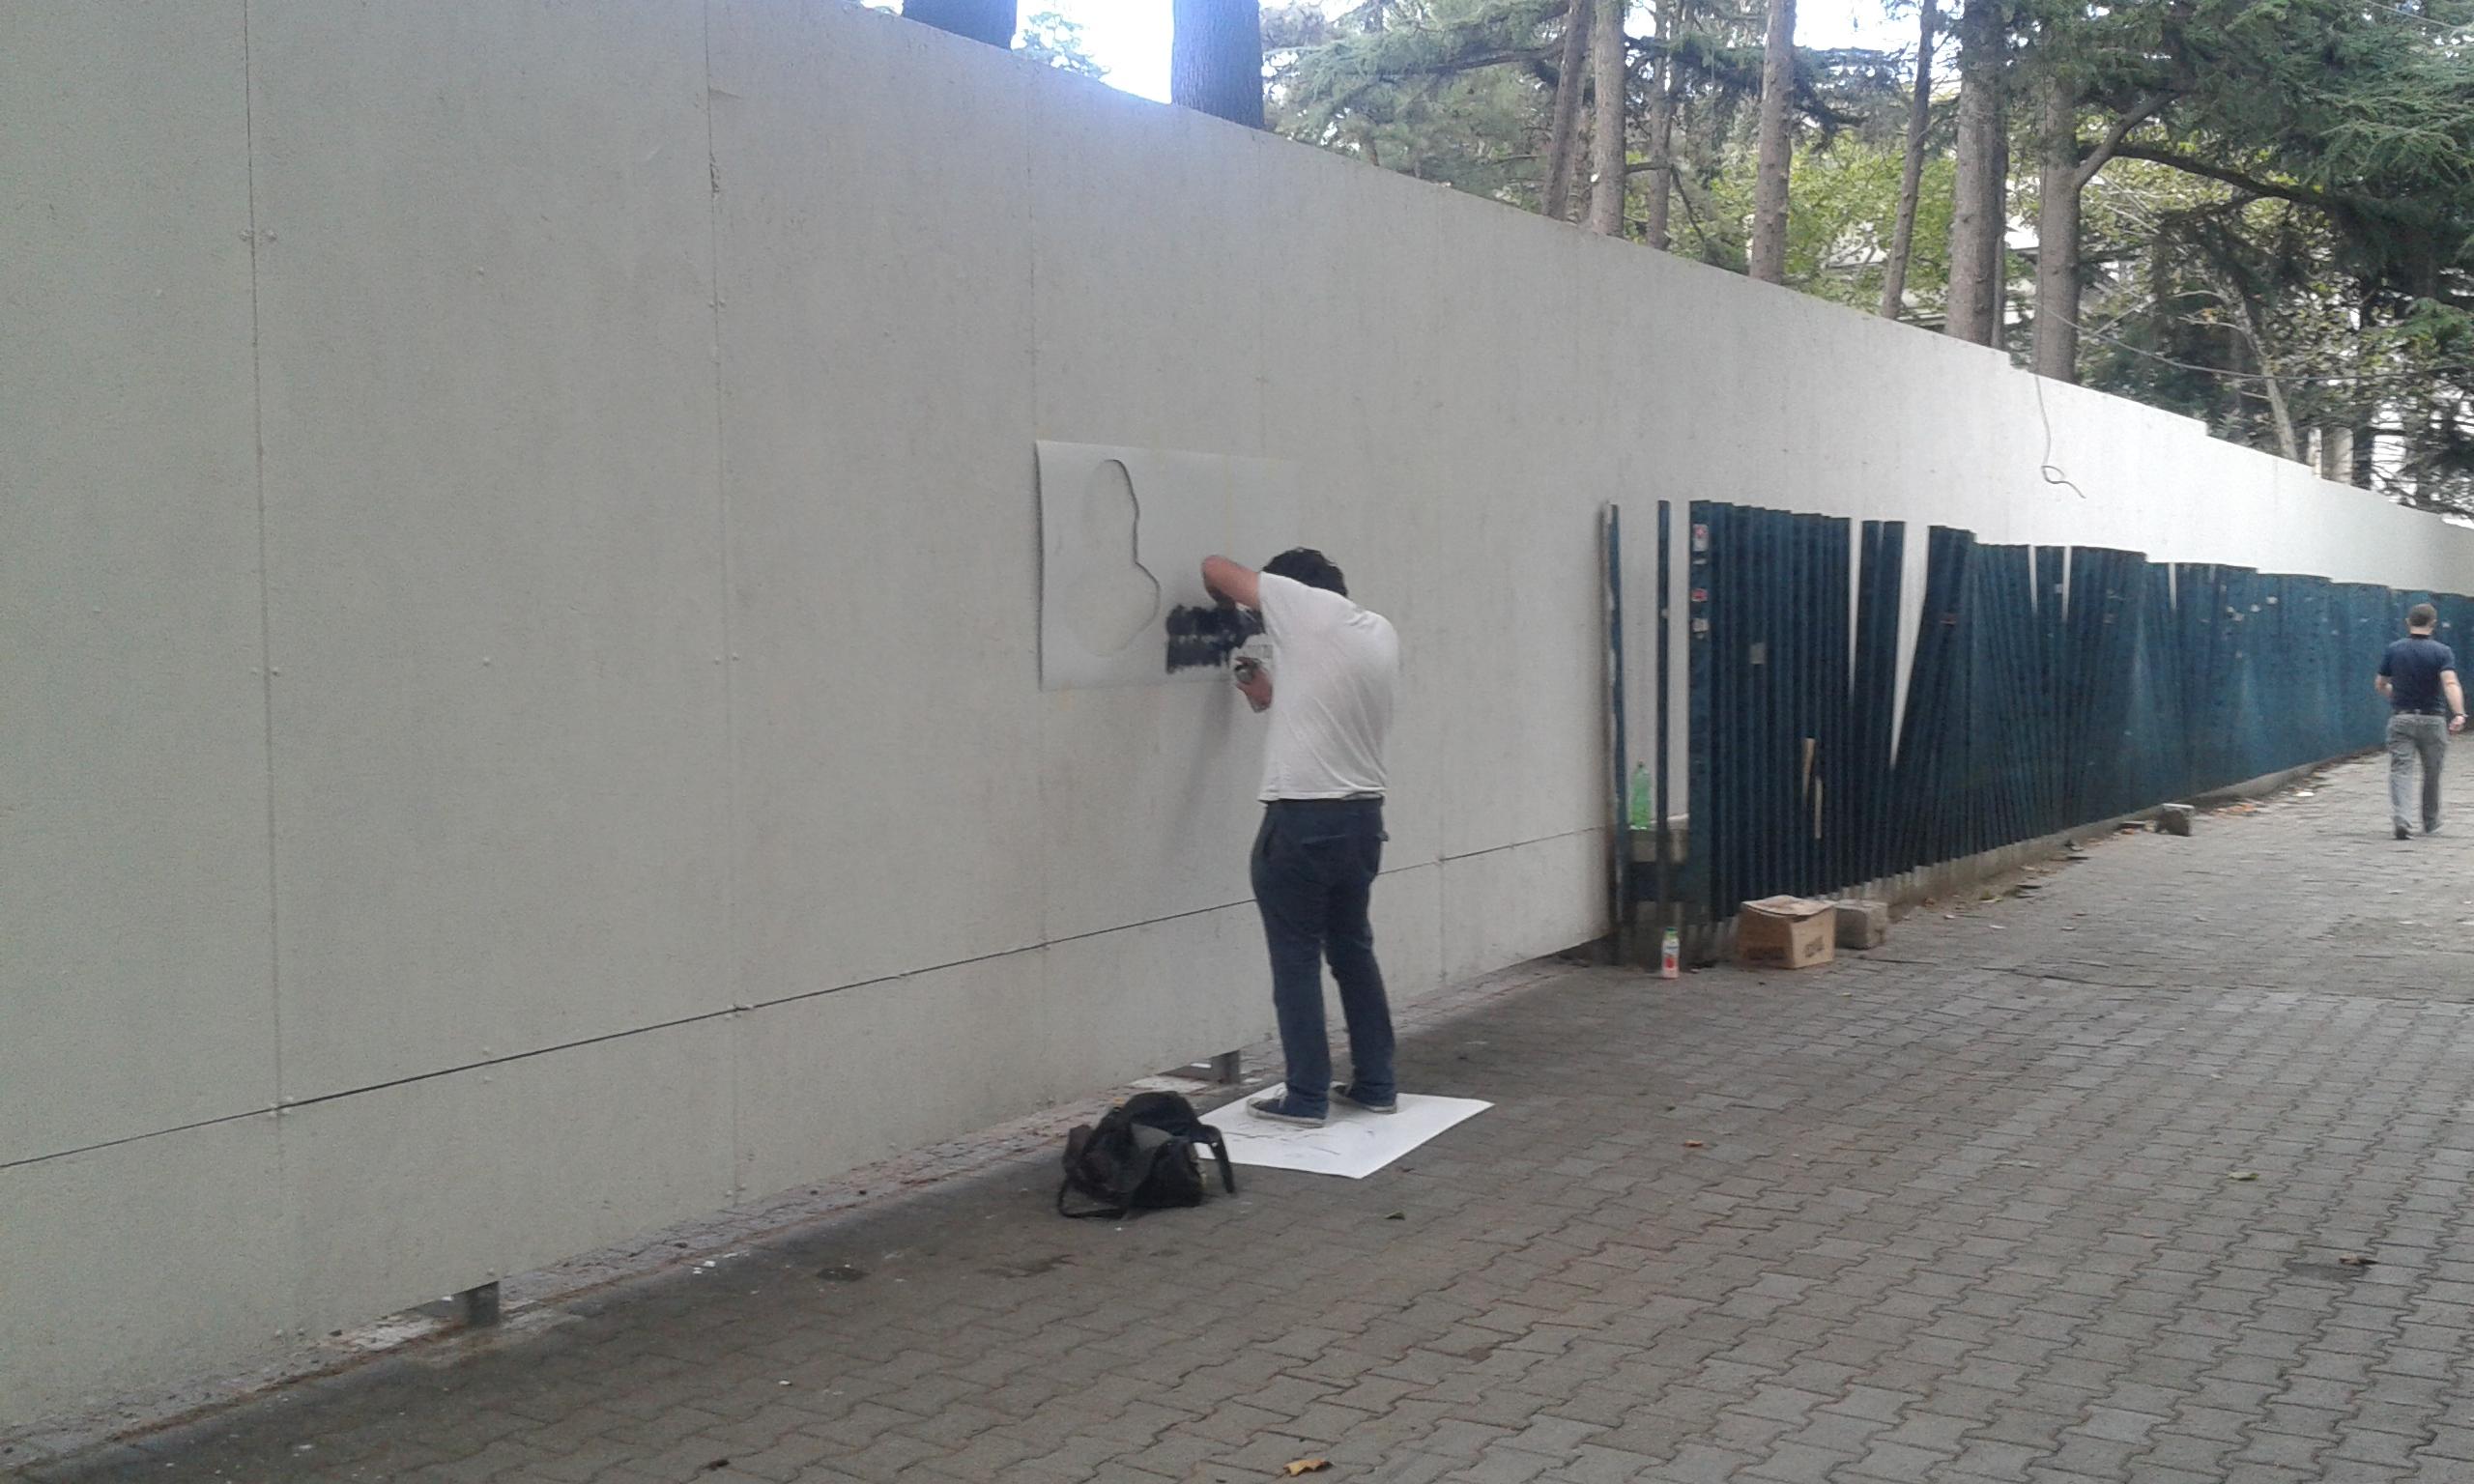 Composite Image Of Stencil Graffiti >> File Tbilisi Georgia Georgian Artist Making A Stencil Graffiti On